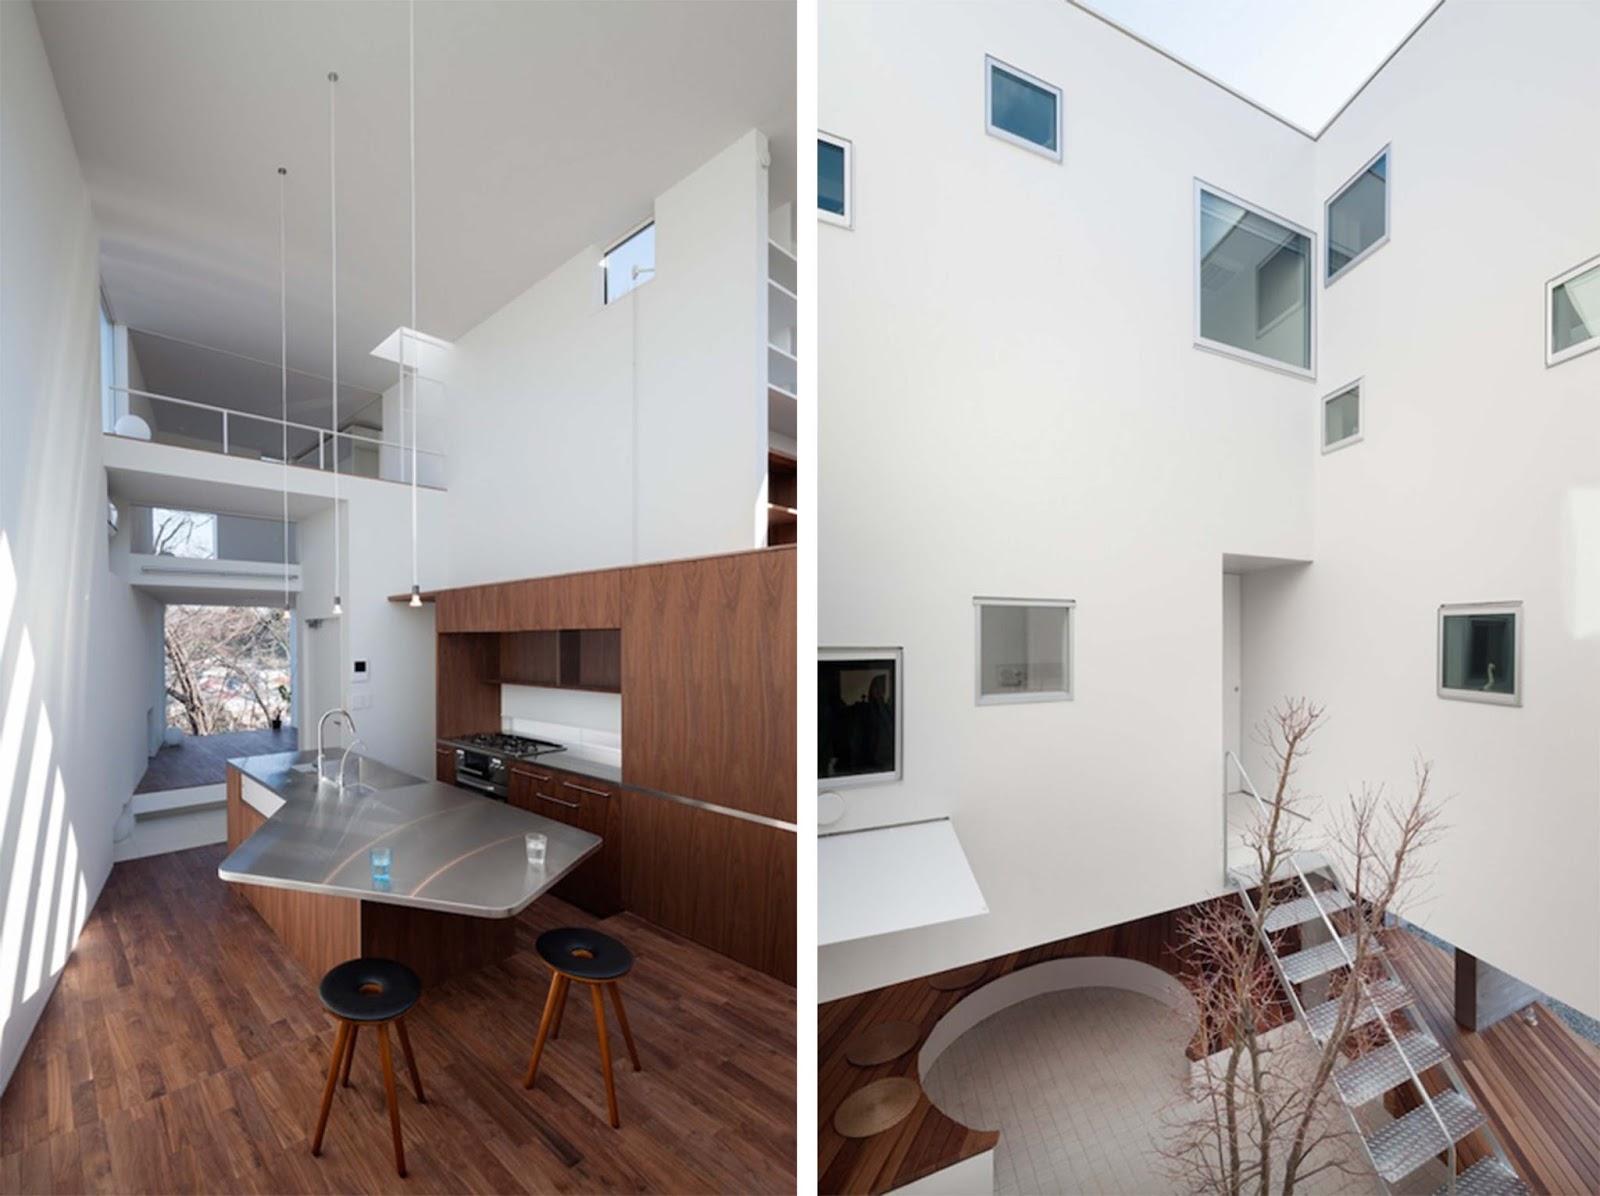 Beyond The Hill House By Kazuhiko Kishimoto Dello Studio ACAA ARC  #38221C 1600 1196 Sala Da Pranzo All'ingresso